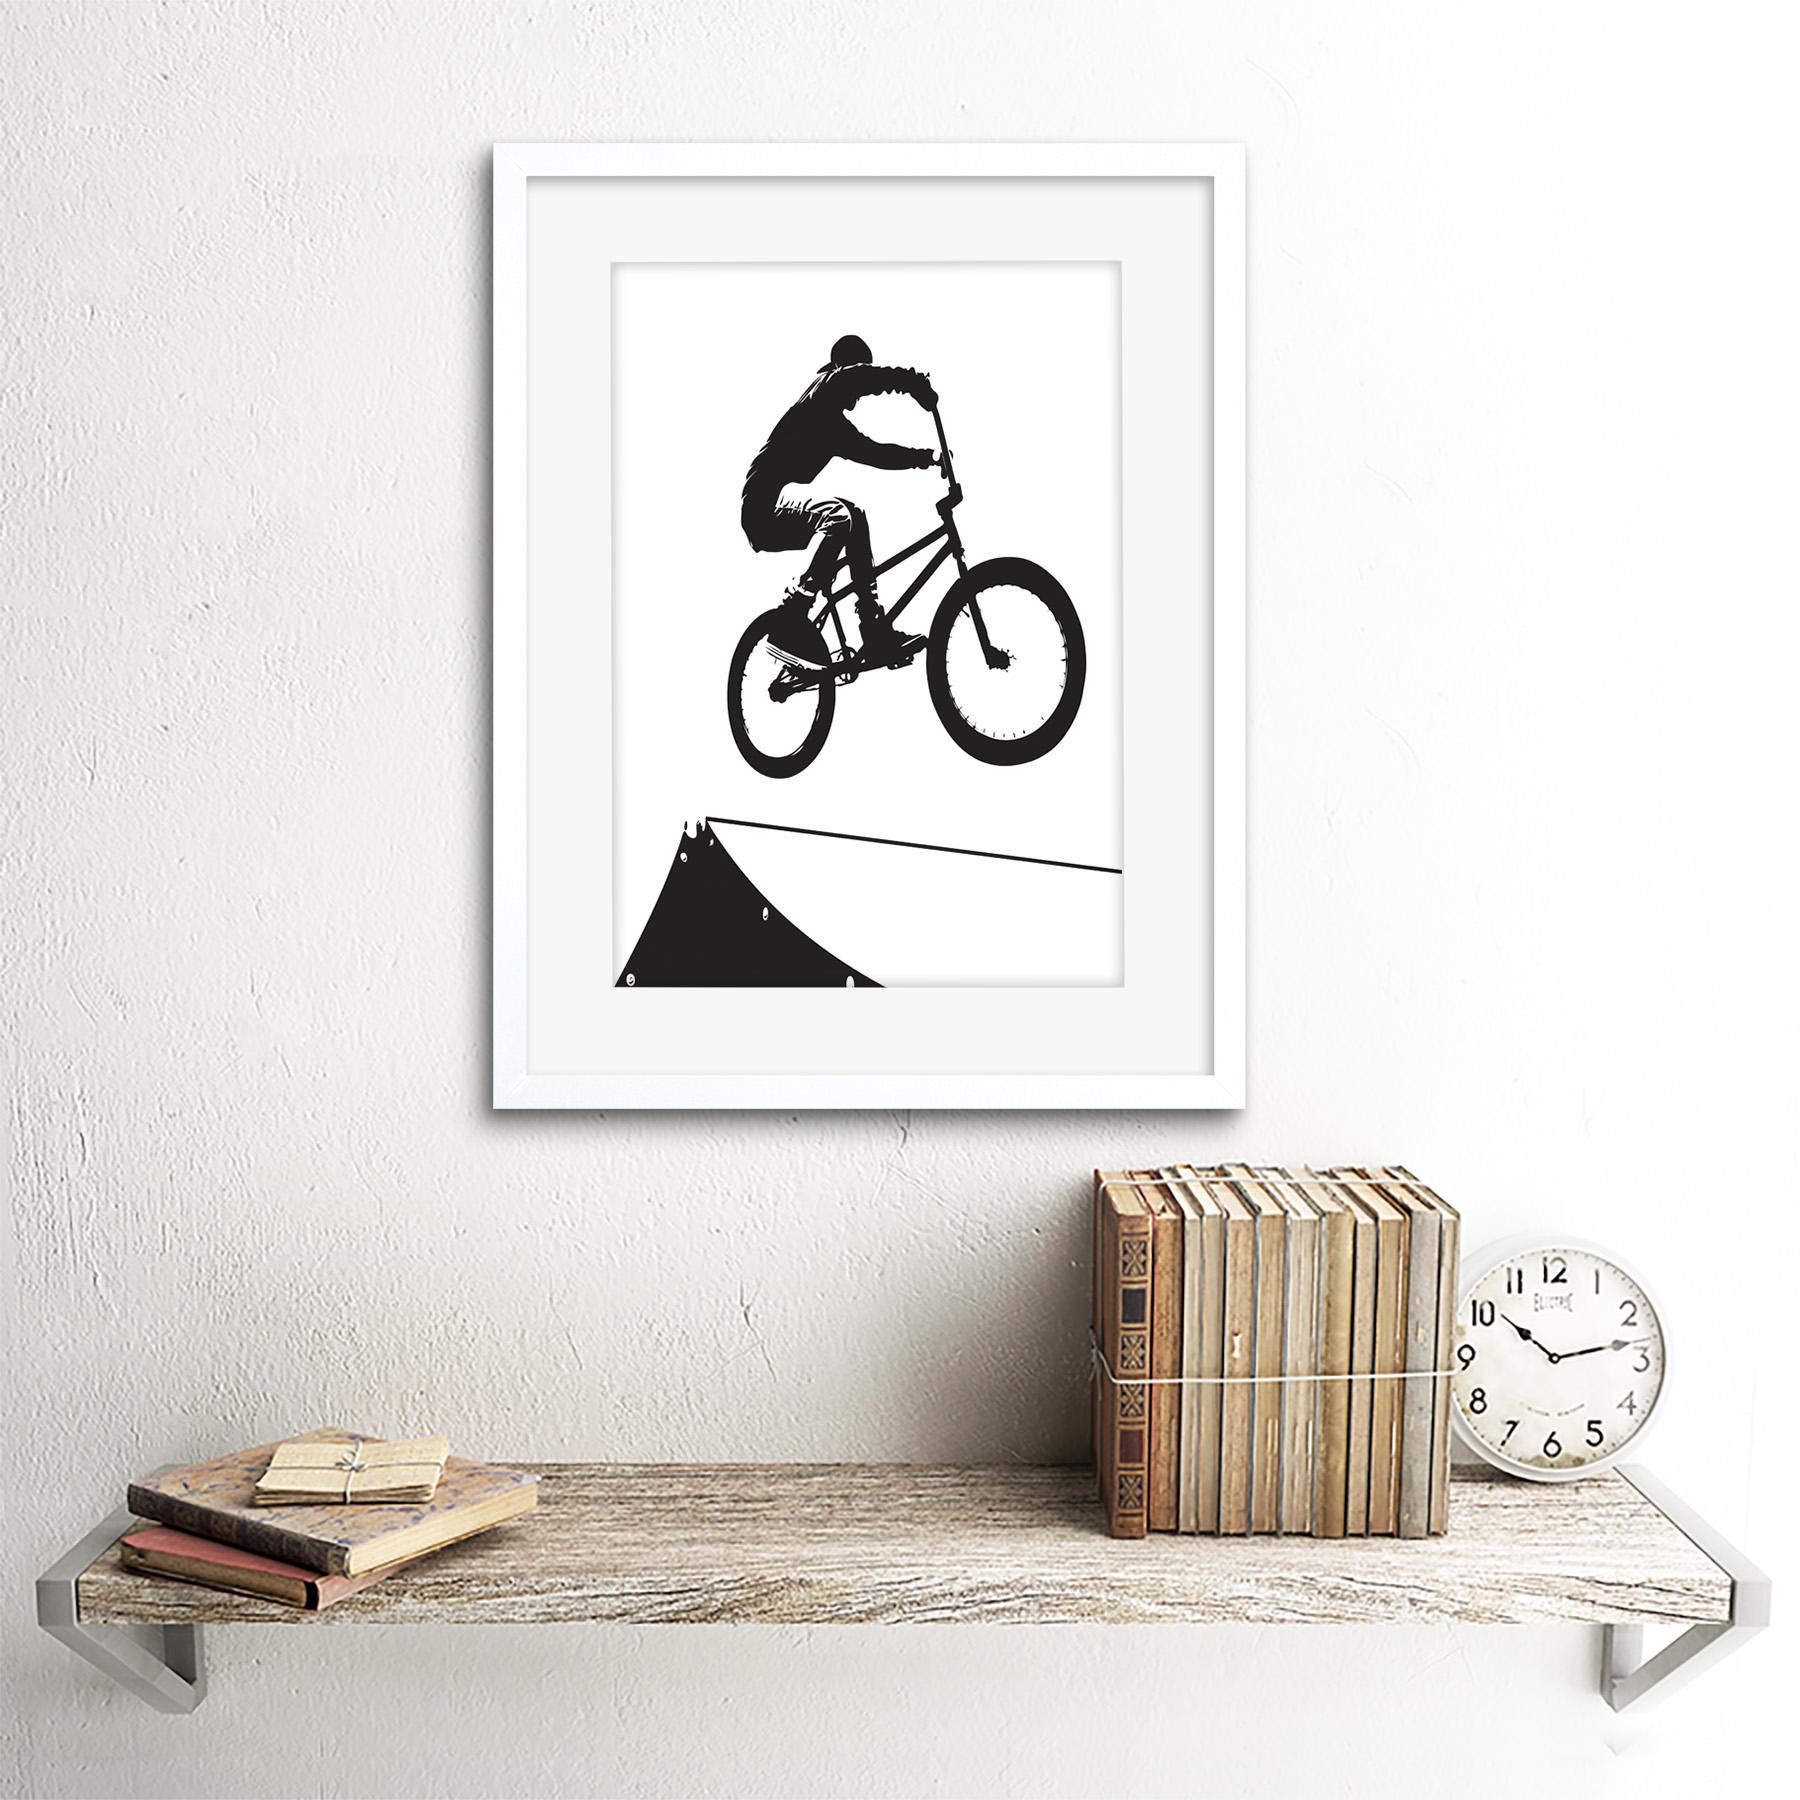 "Indexbild 22 - Painting Sport Bmx Bike Bicycle Jump Air Ramp Black White Framed Print 12x16"""